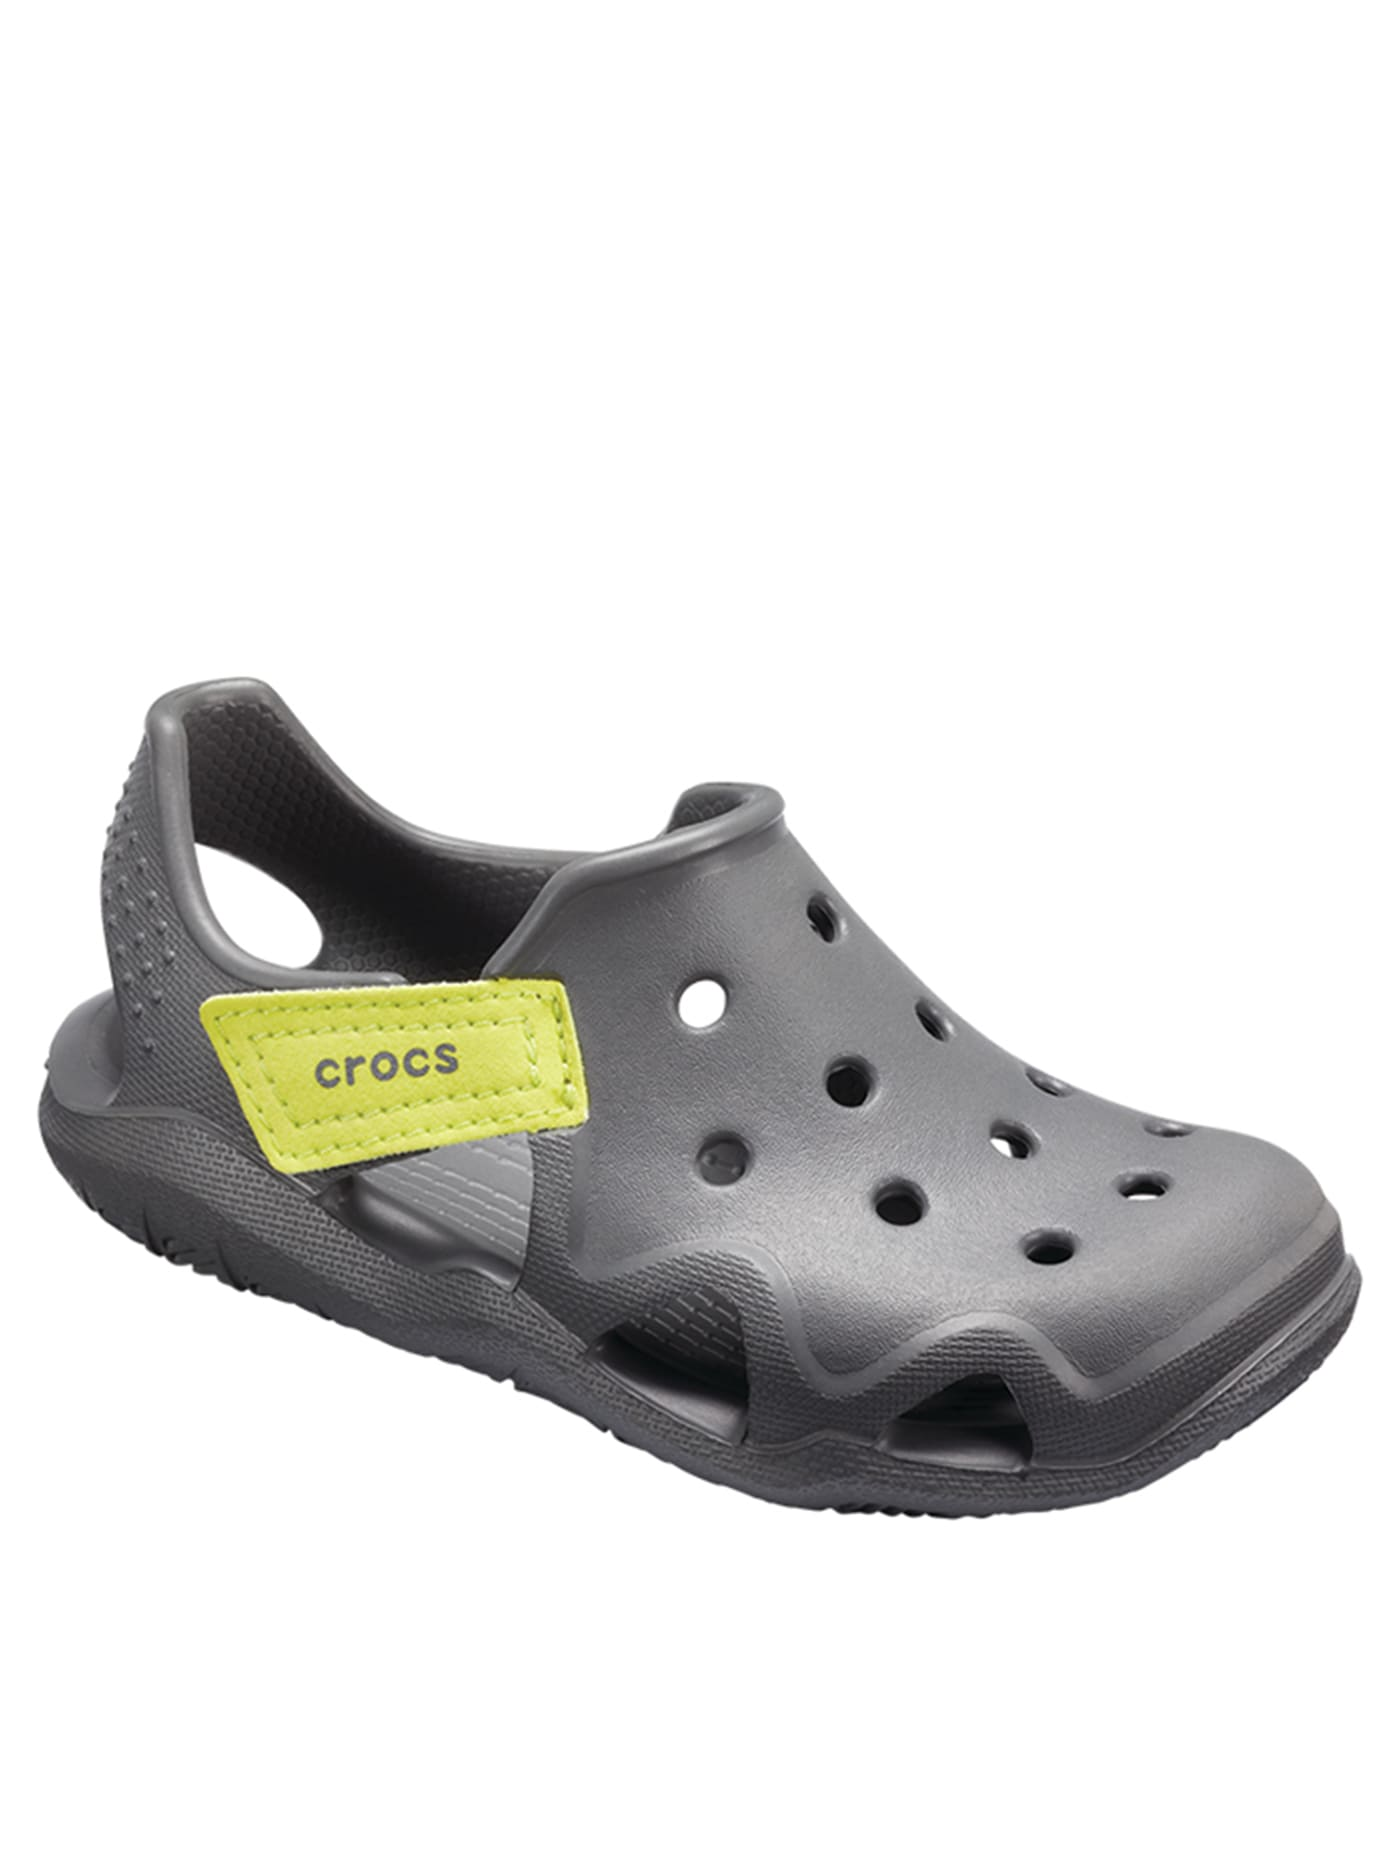 Crocs Kids Swiftwater Wave Water Sandal